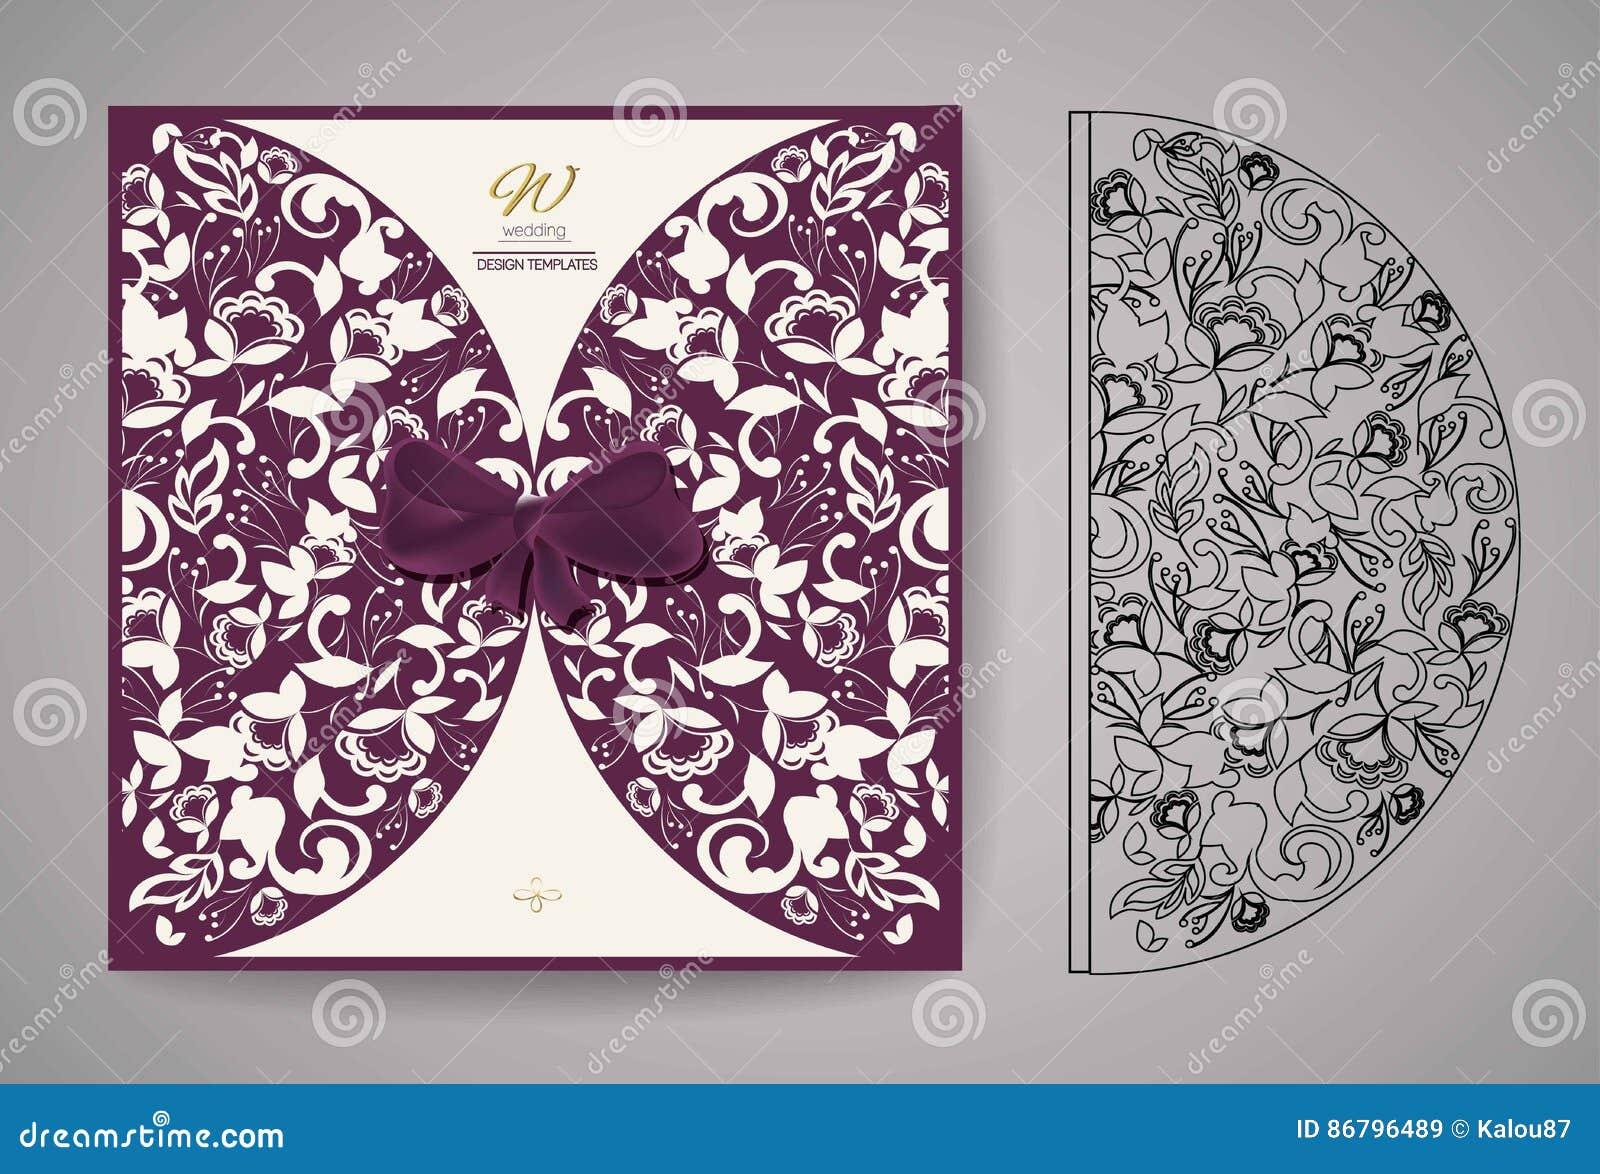 Laser Cut Invitation Card Laser Cutting Pattern For Invitation